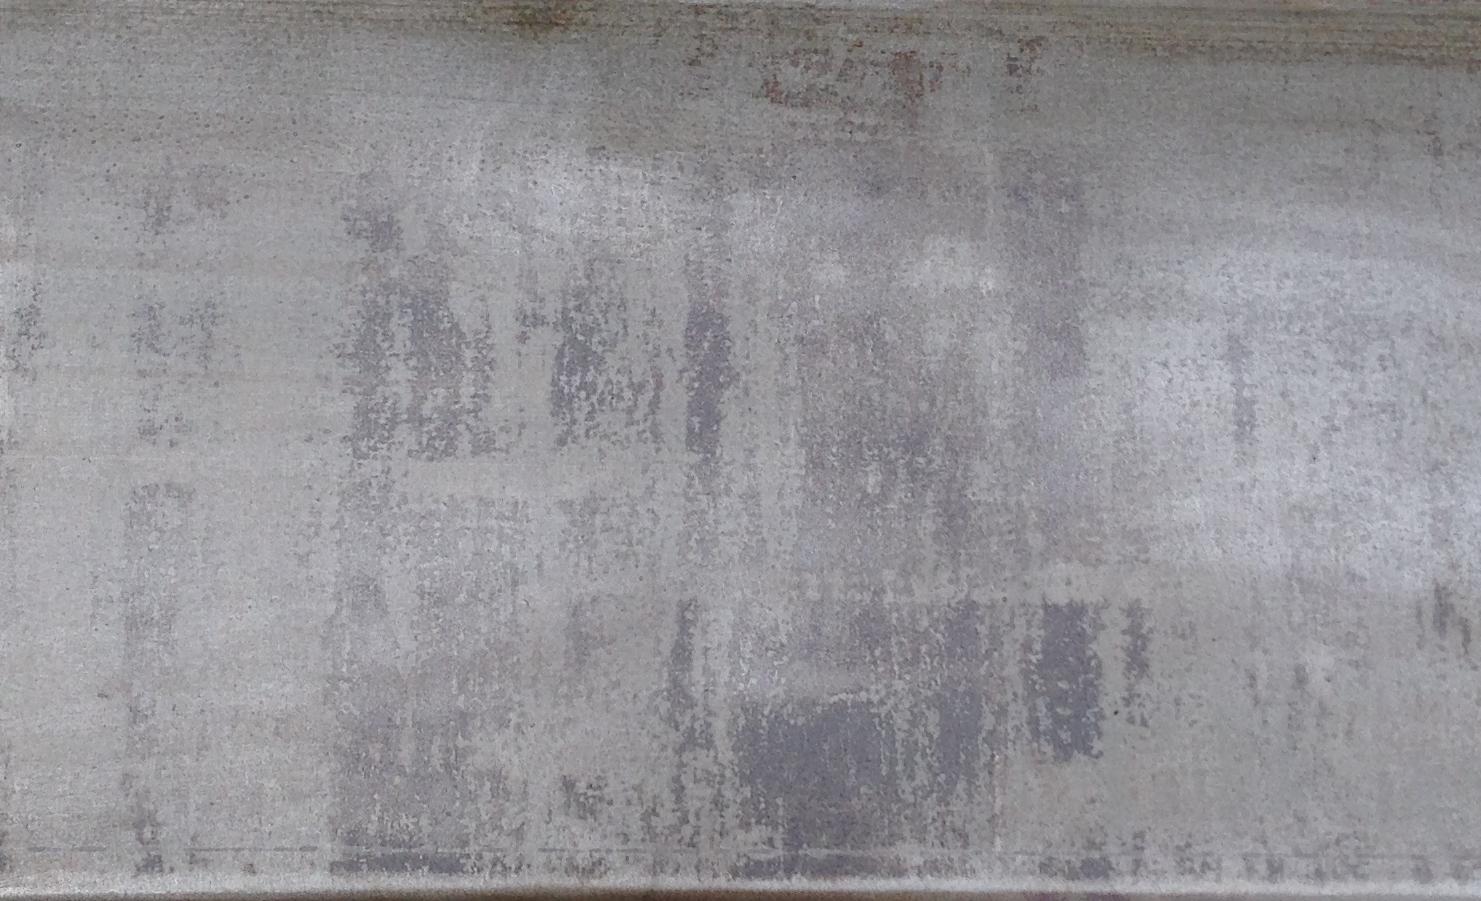 Couleur gris anthracite - Couleur gris anthracite peinture ...